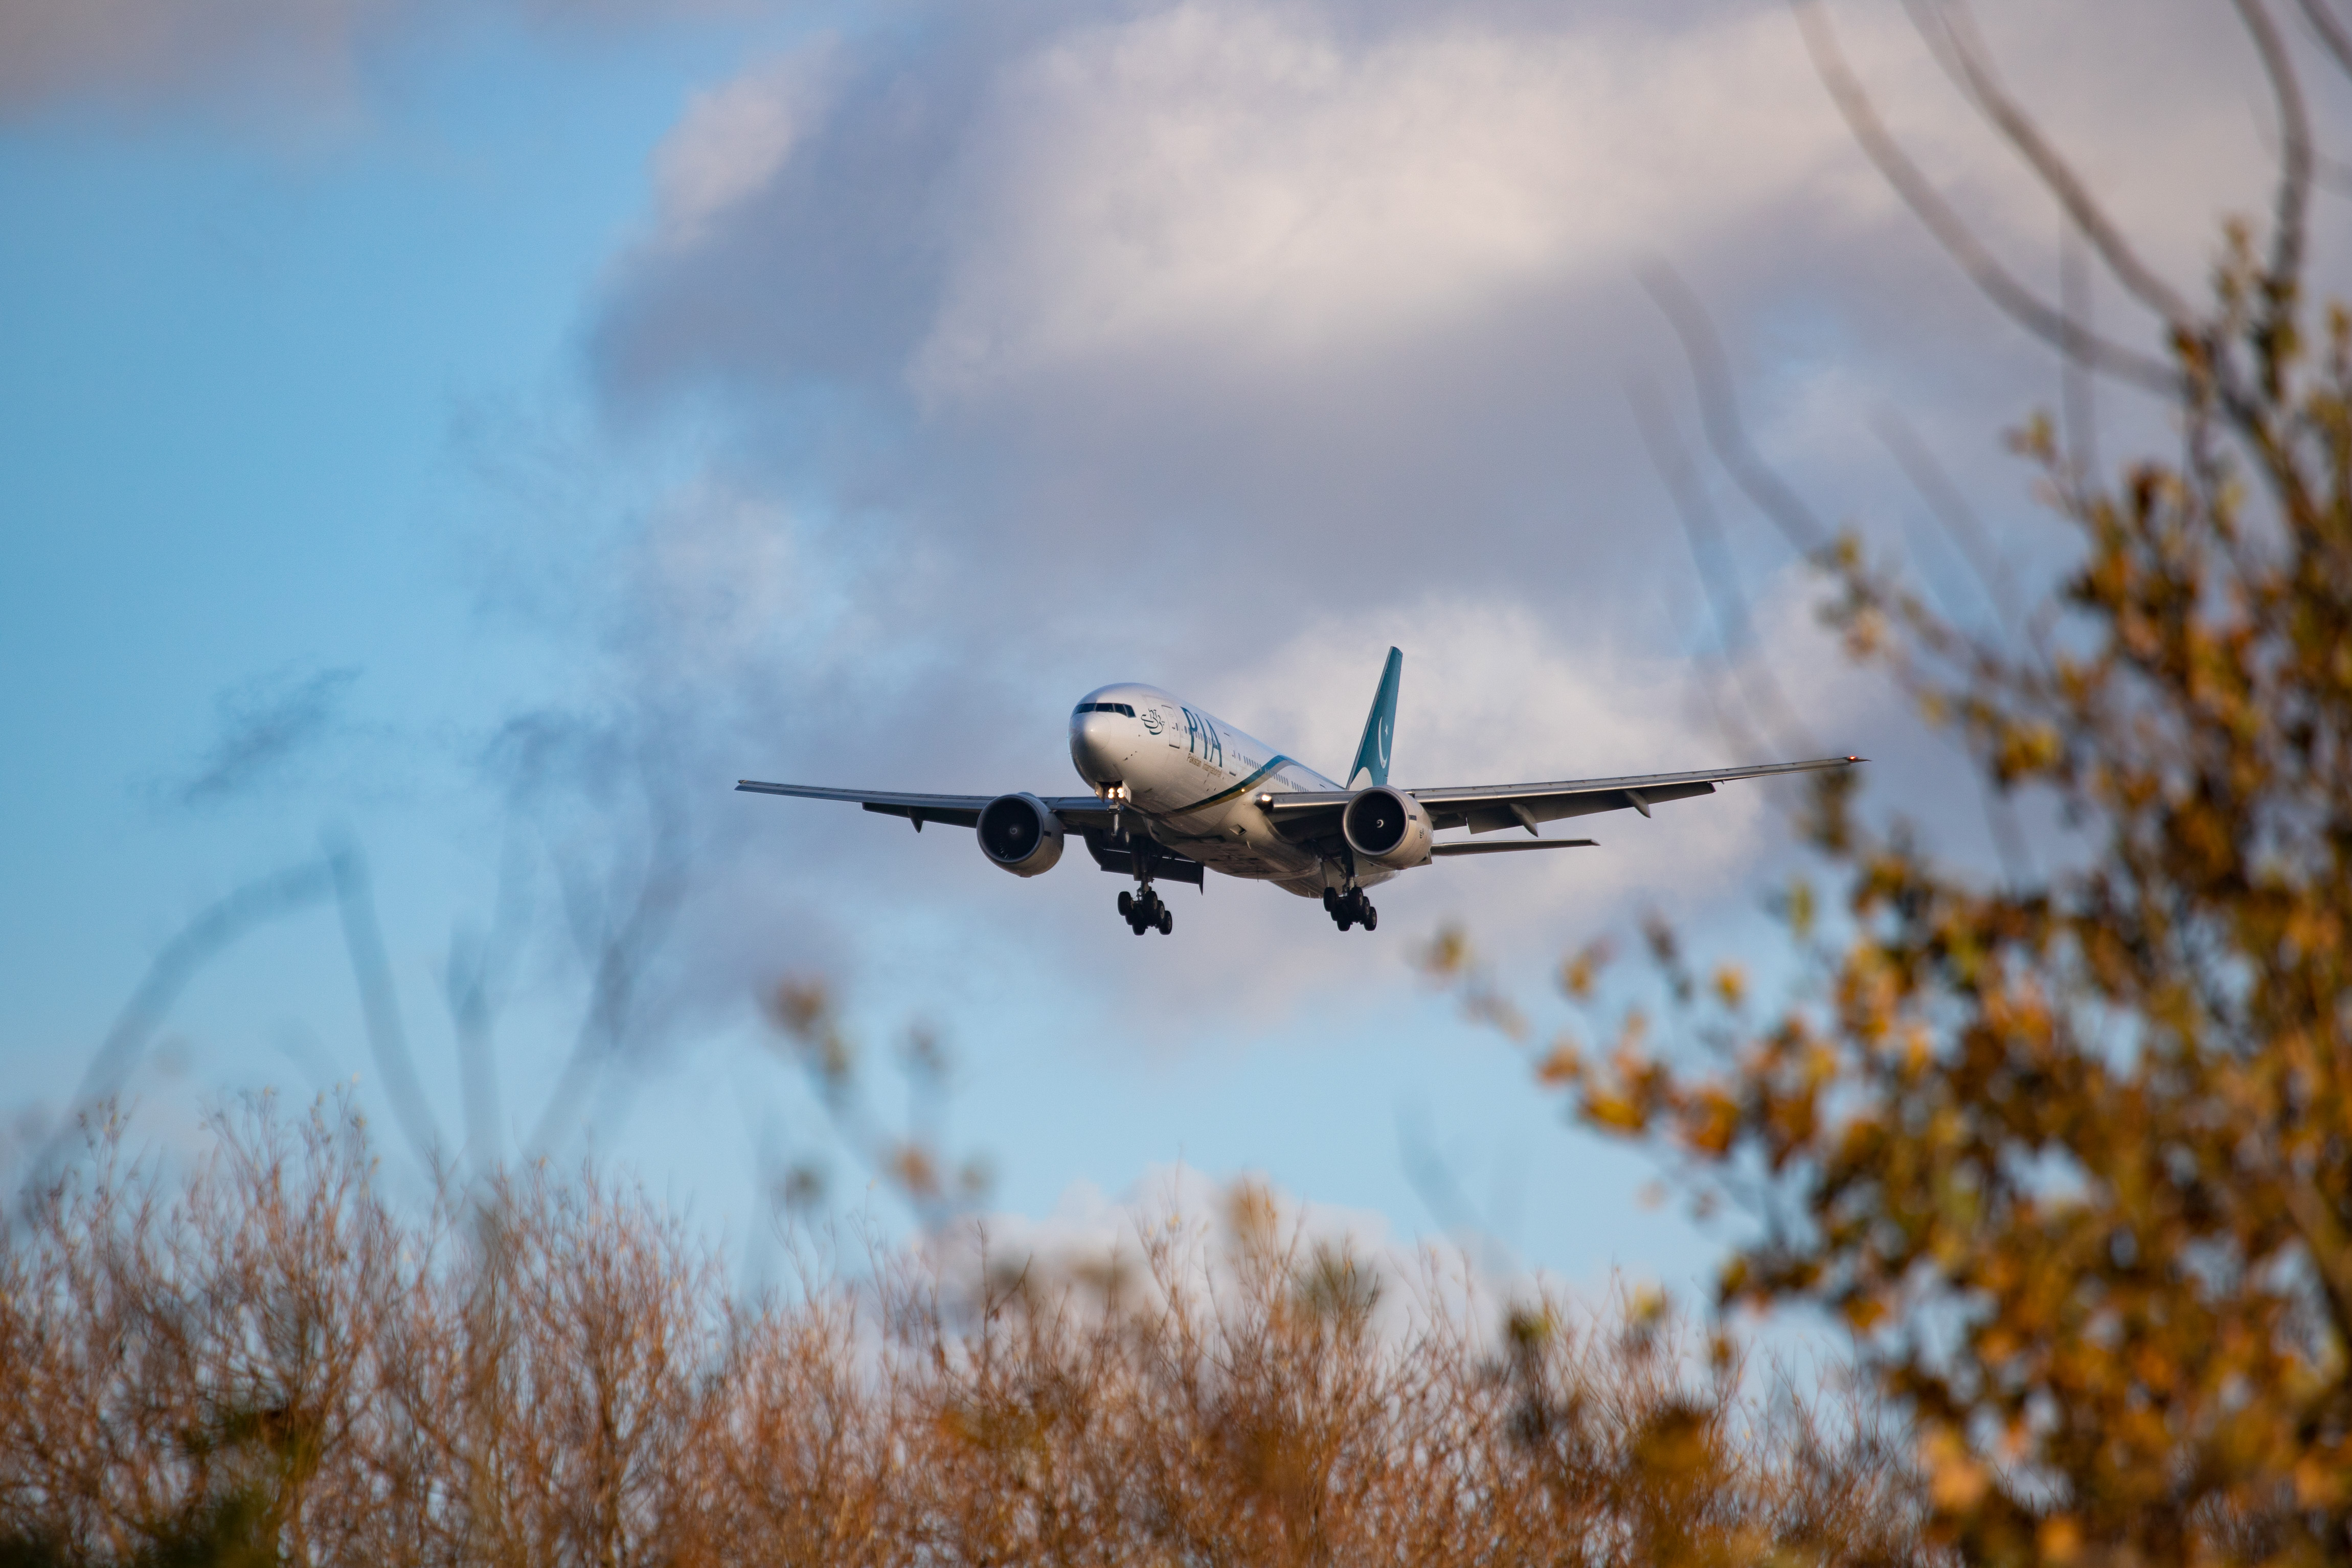 Pakistani Passenger Plane Crashes Near Karachi 107 On